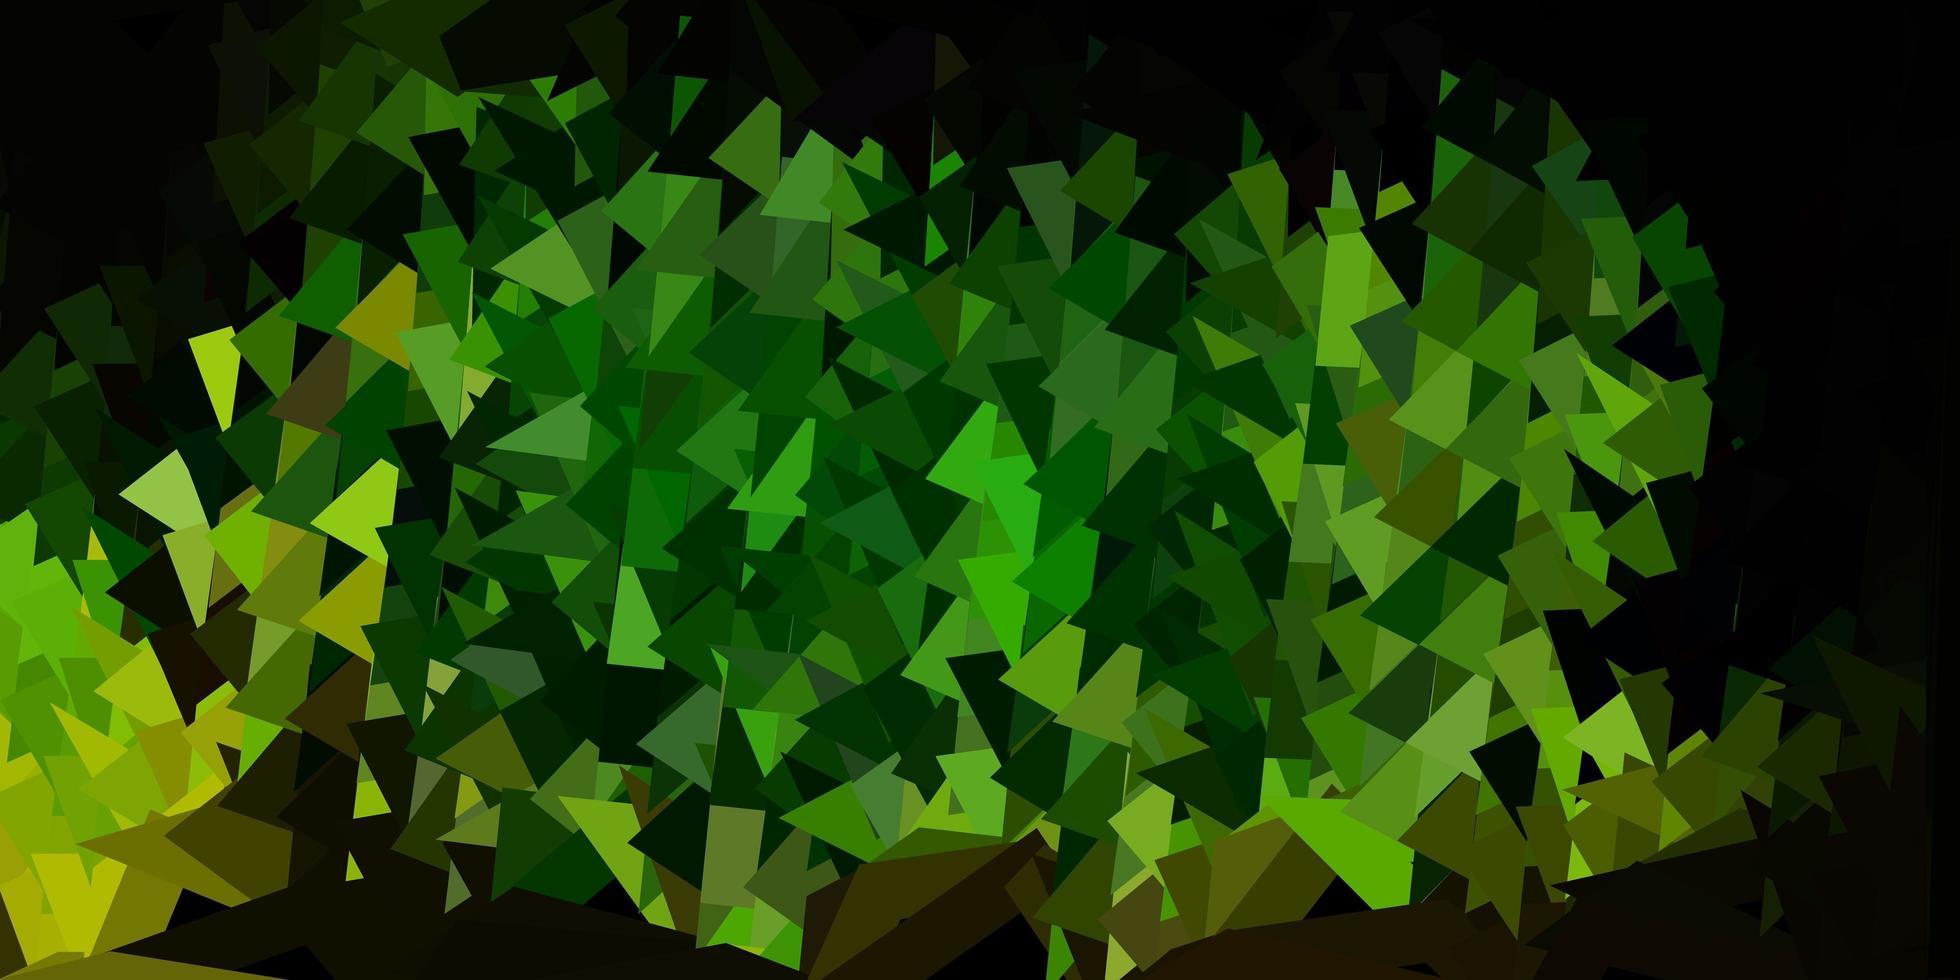 mörkgrön, gul vektorgradient polygon tapet. vektor